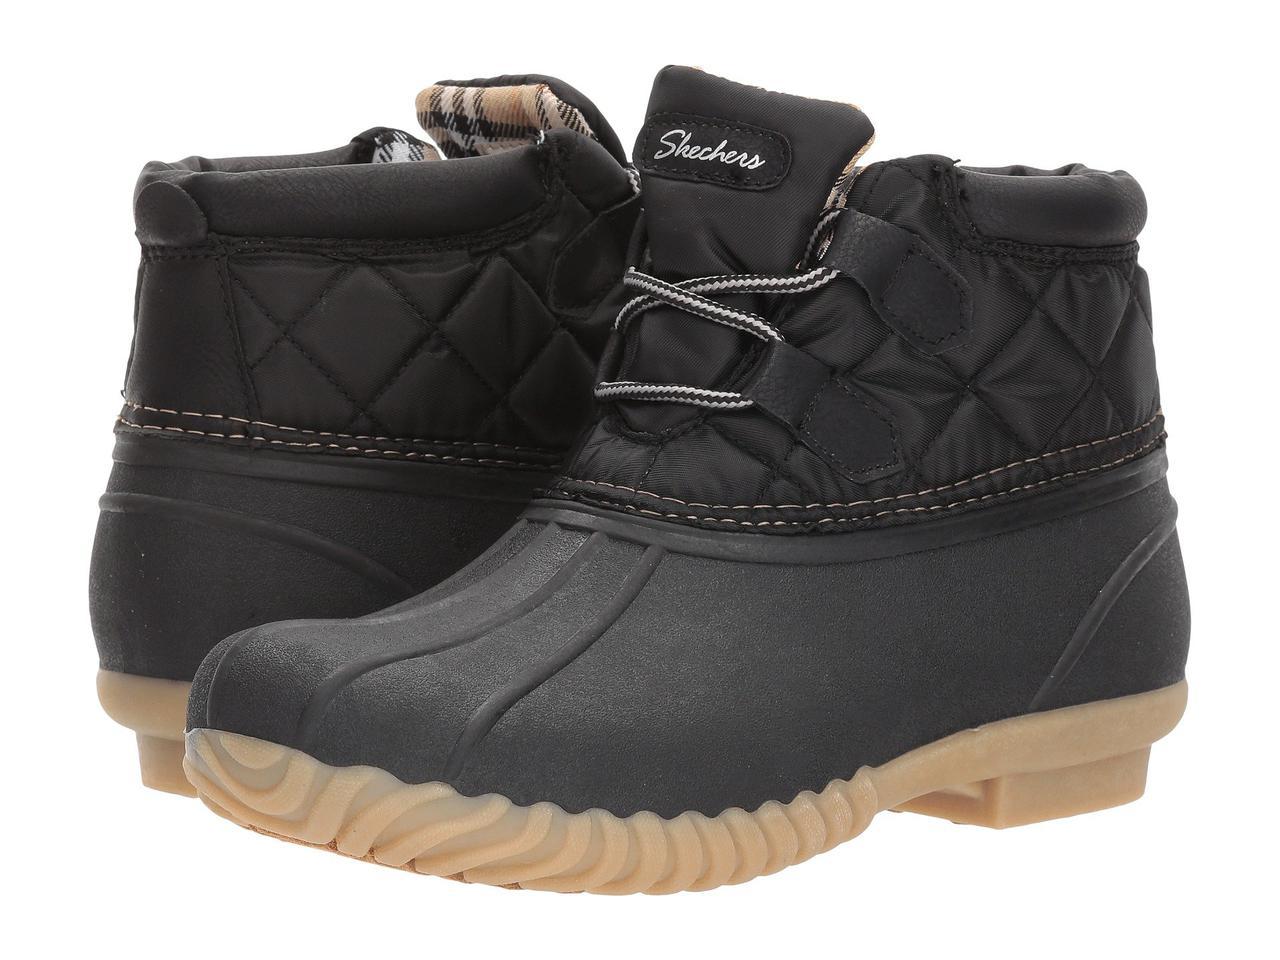 Ботинки Сапоги (Оригинал) SKECHERS Hampshire Black - TopUSA